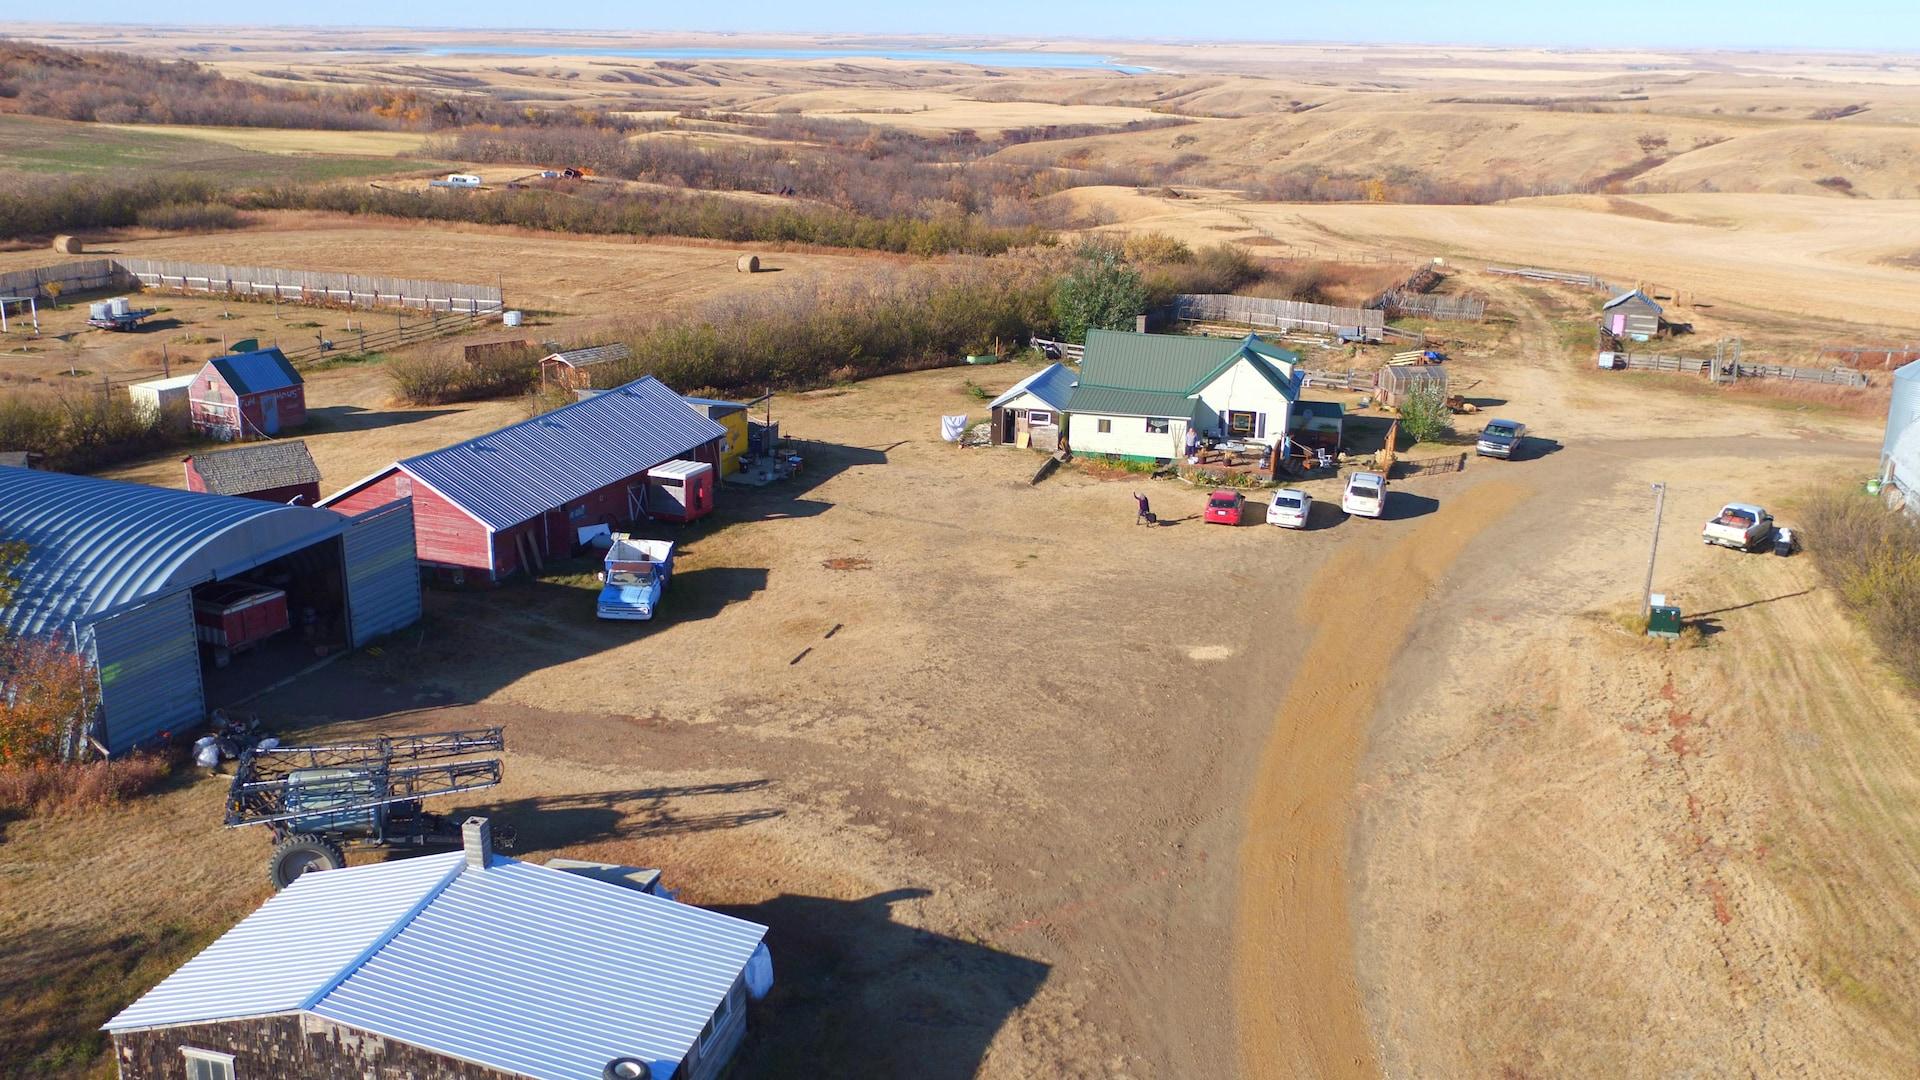 Vue aérienne de la ferme où a grandi Annette Campagne.